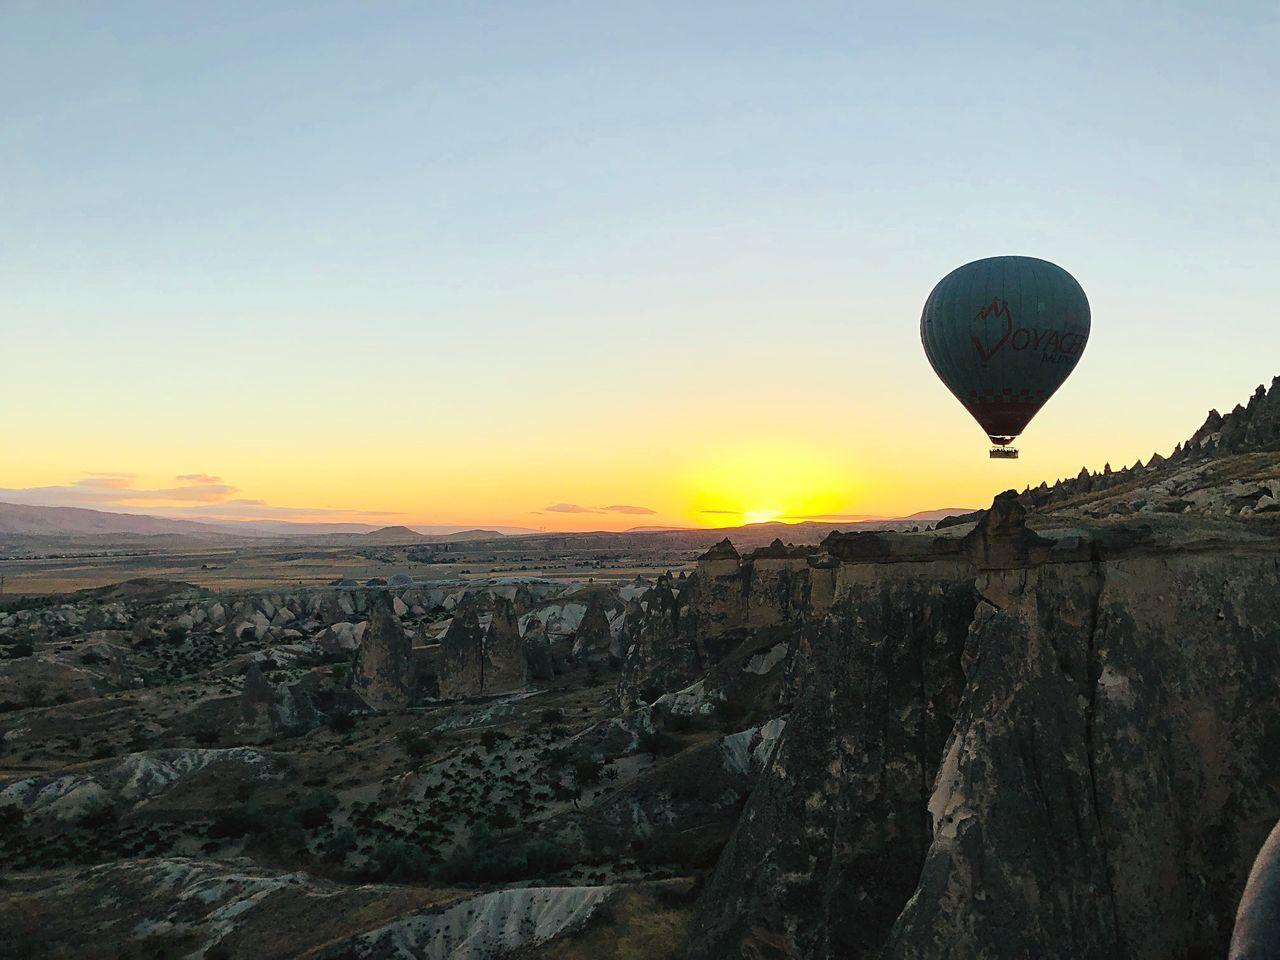 HOT AIR BALLOONS ON ROCK AGAINST SKY